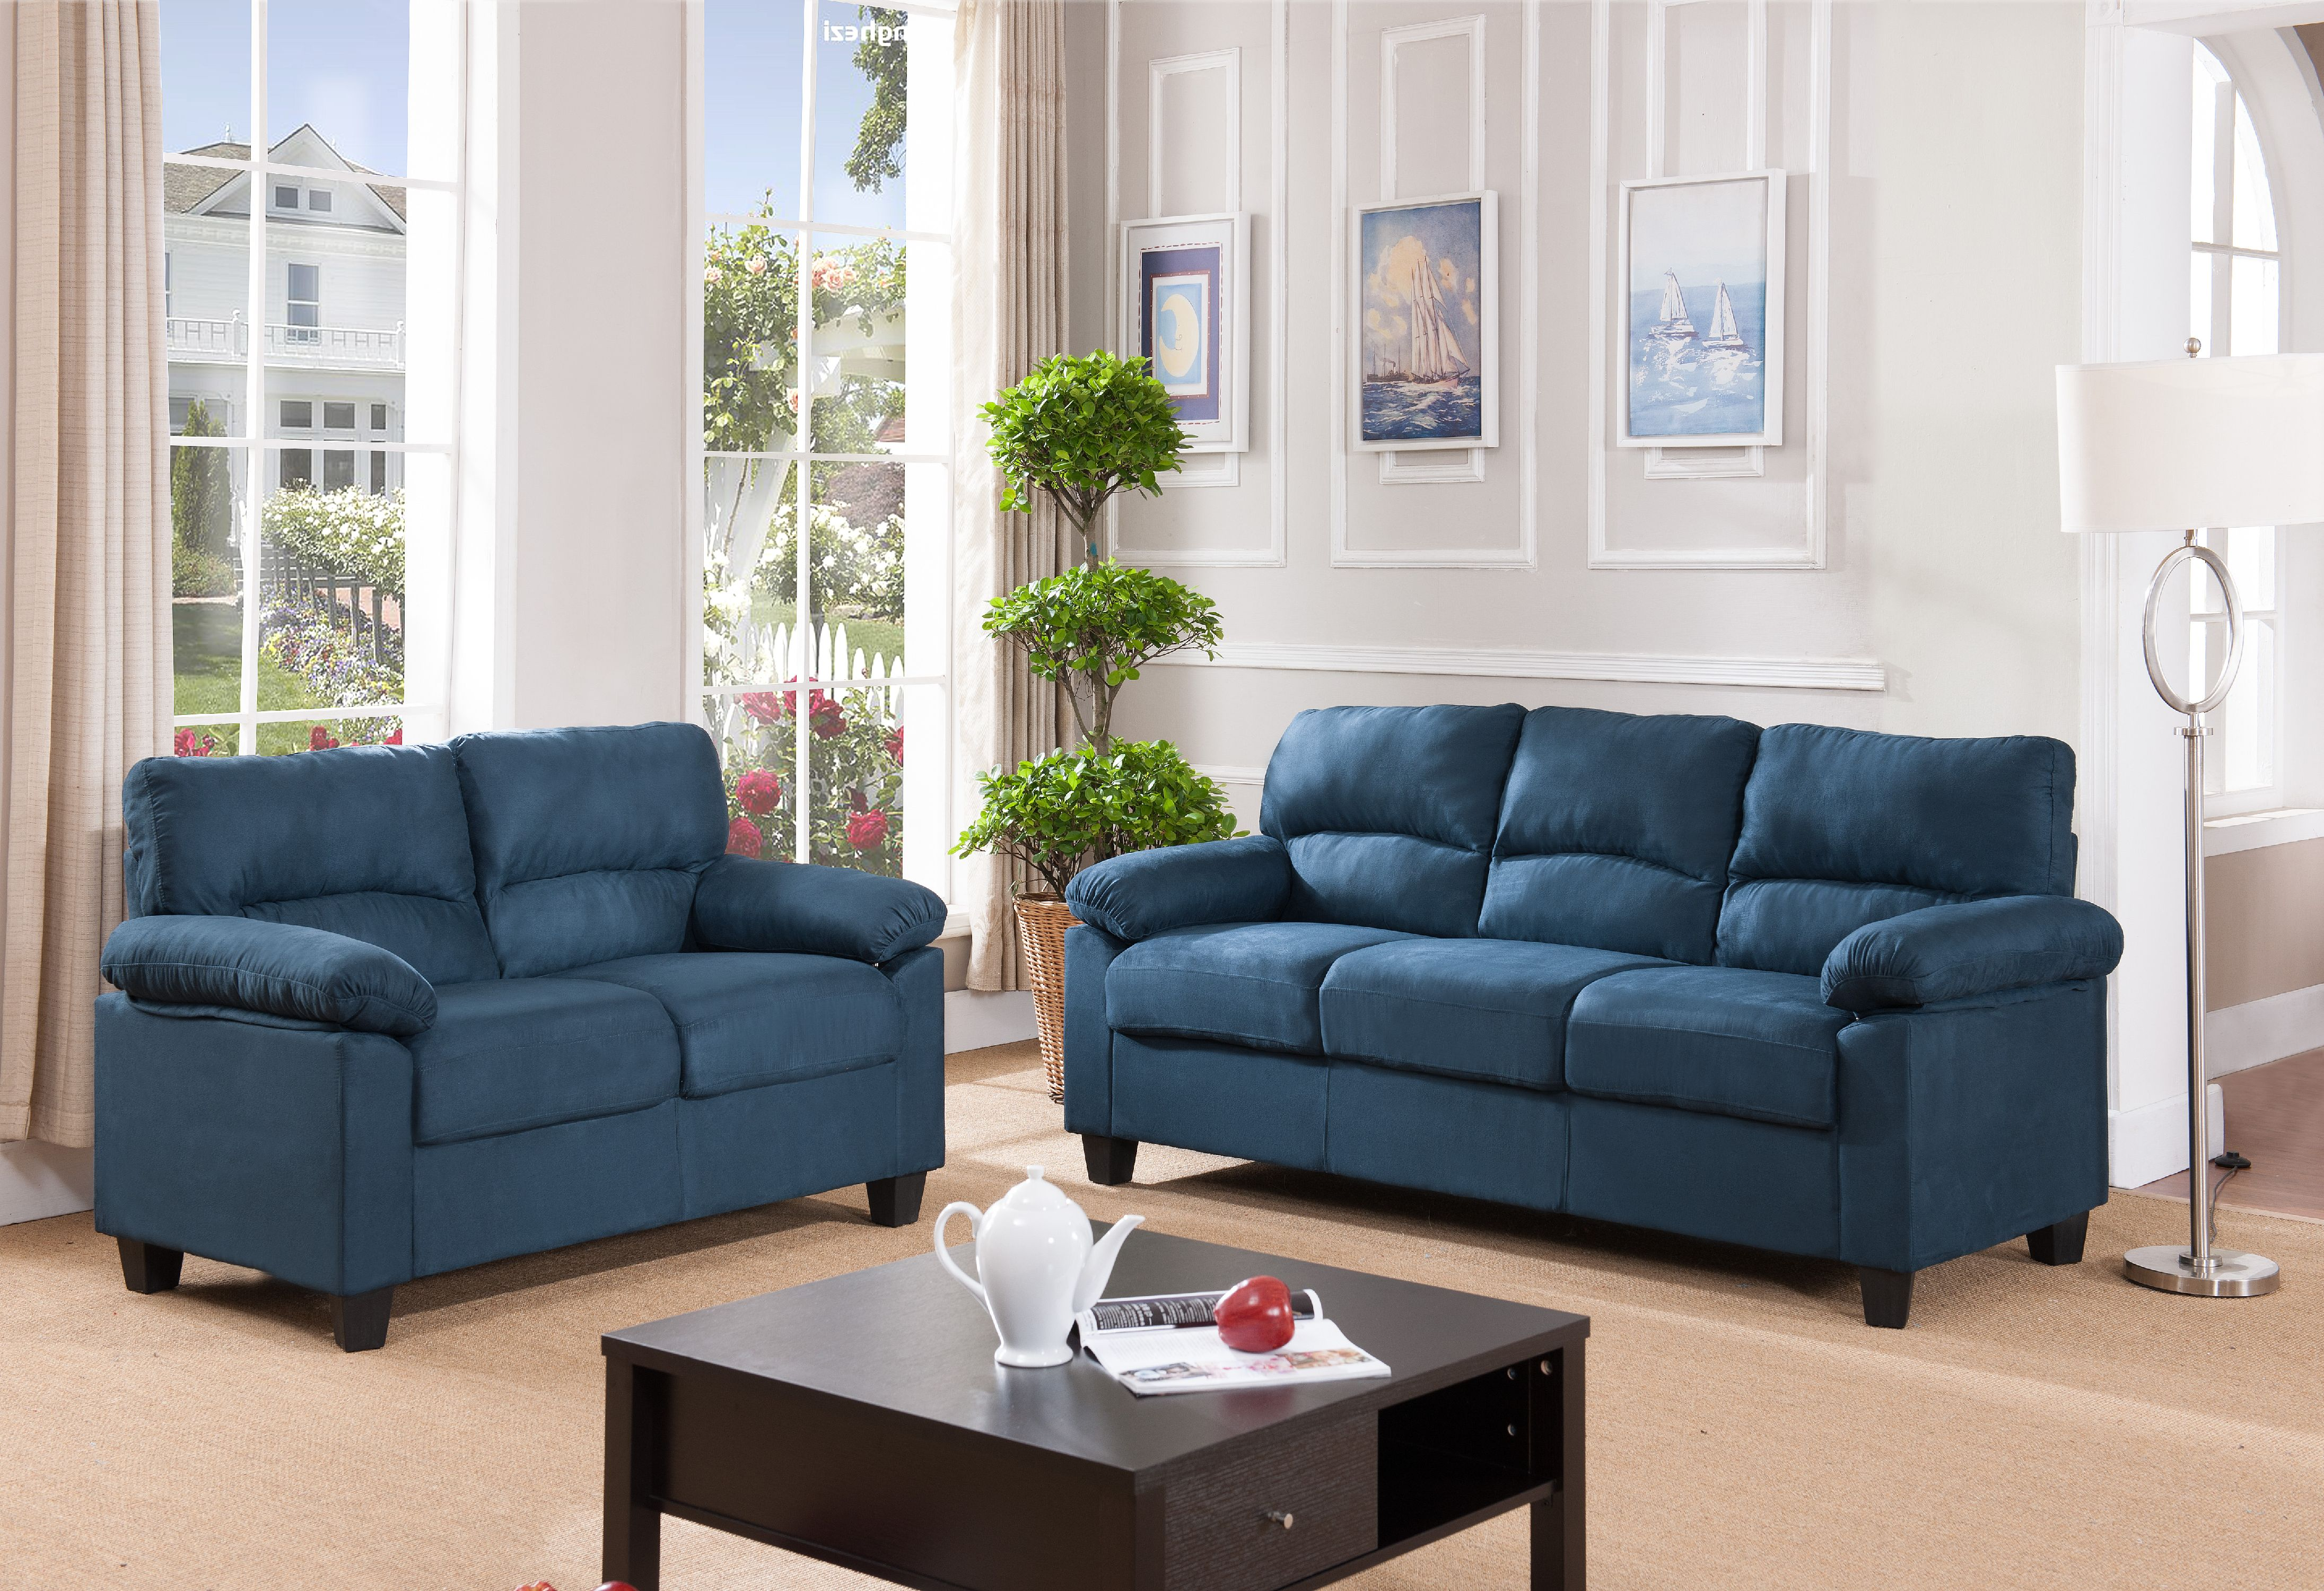 Jena 2 piece blue upholstered microfiber transitional stationary living room set 55 5 loveseat 74 sofa walmart com